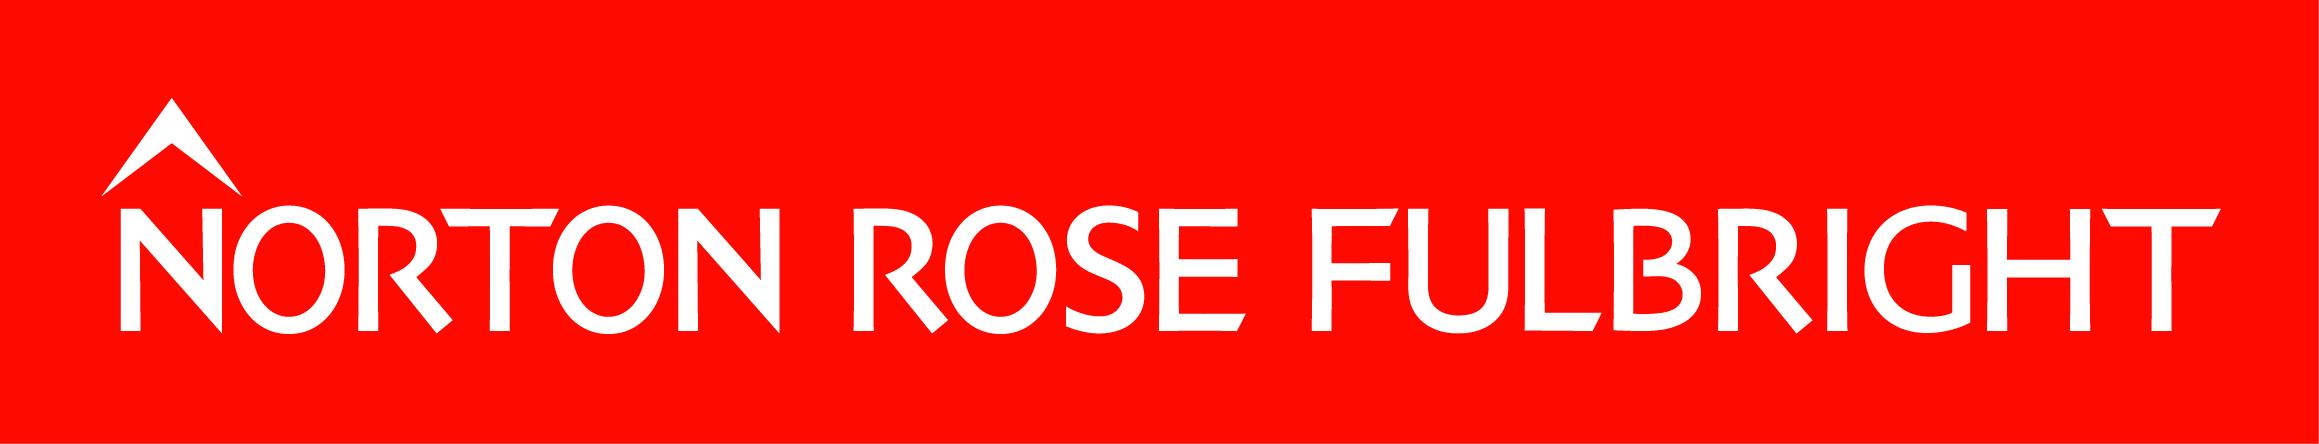 NRF_CMYK_RED_BOX_AW (1)